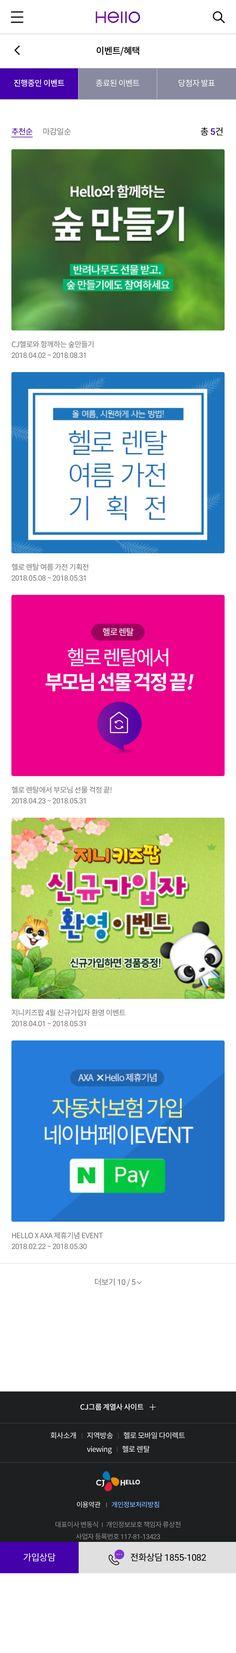 CJ Hello 이벤트 서브메인